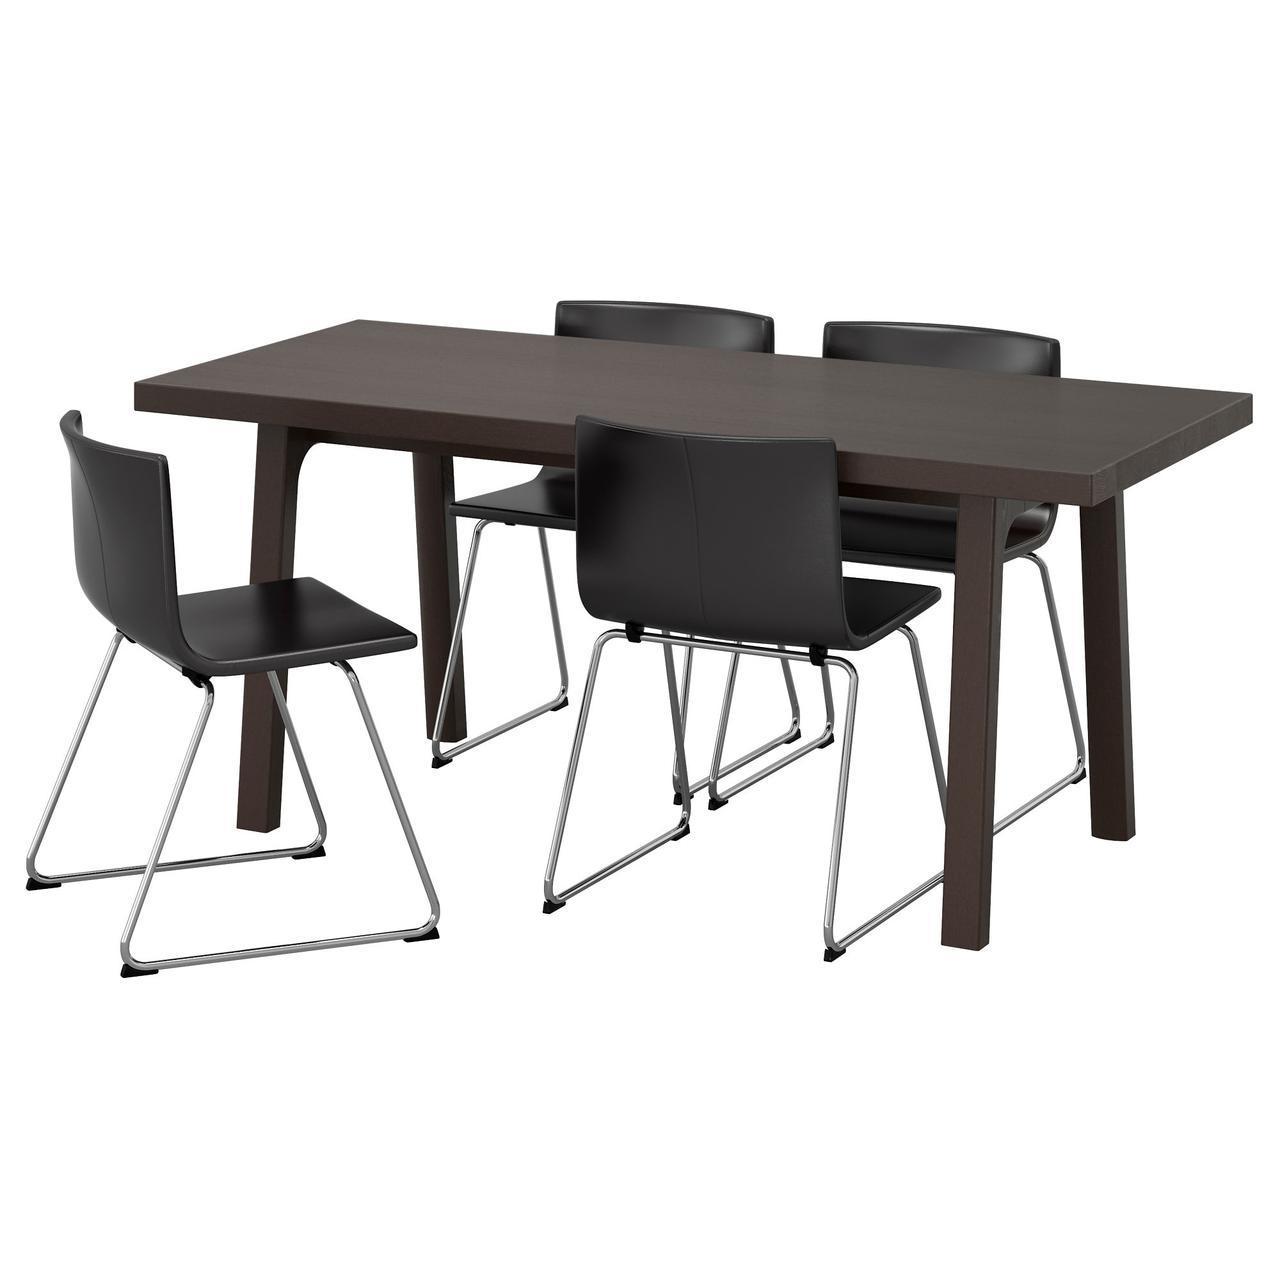 IKEA VASTANBY/VASTANA / BERNHARD (891.615.65) Стол и 4 стула темно-коричневый